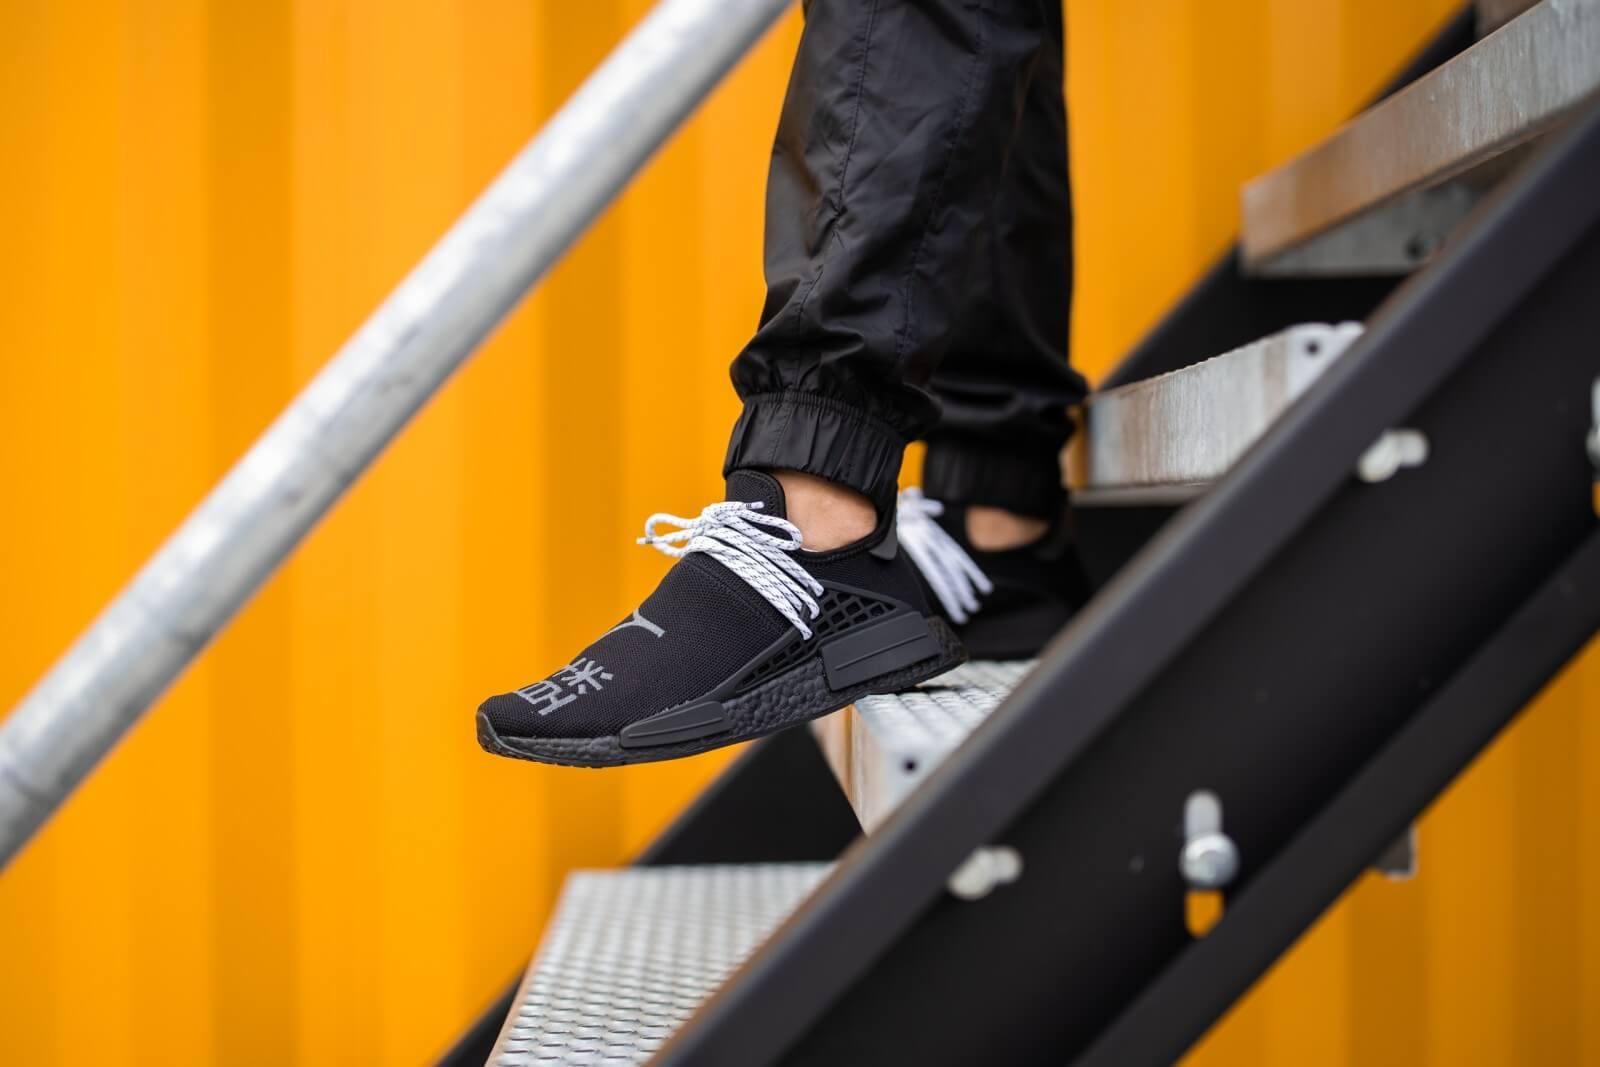 Adidas x Pharrell Williams HU NMD Core